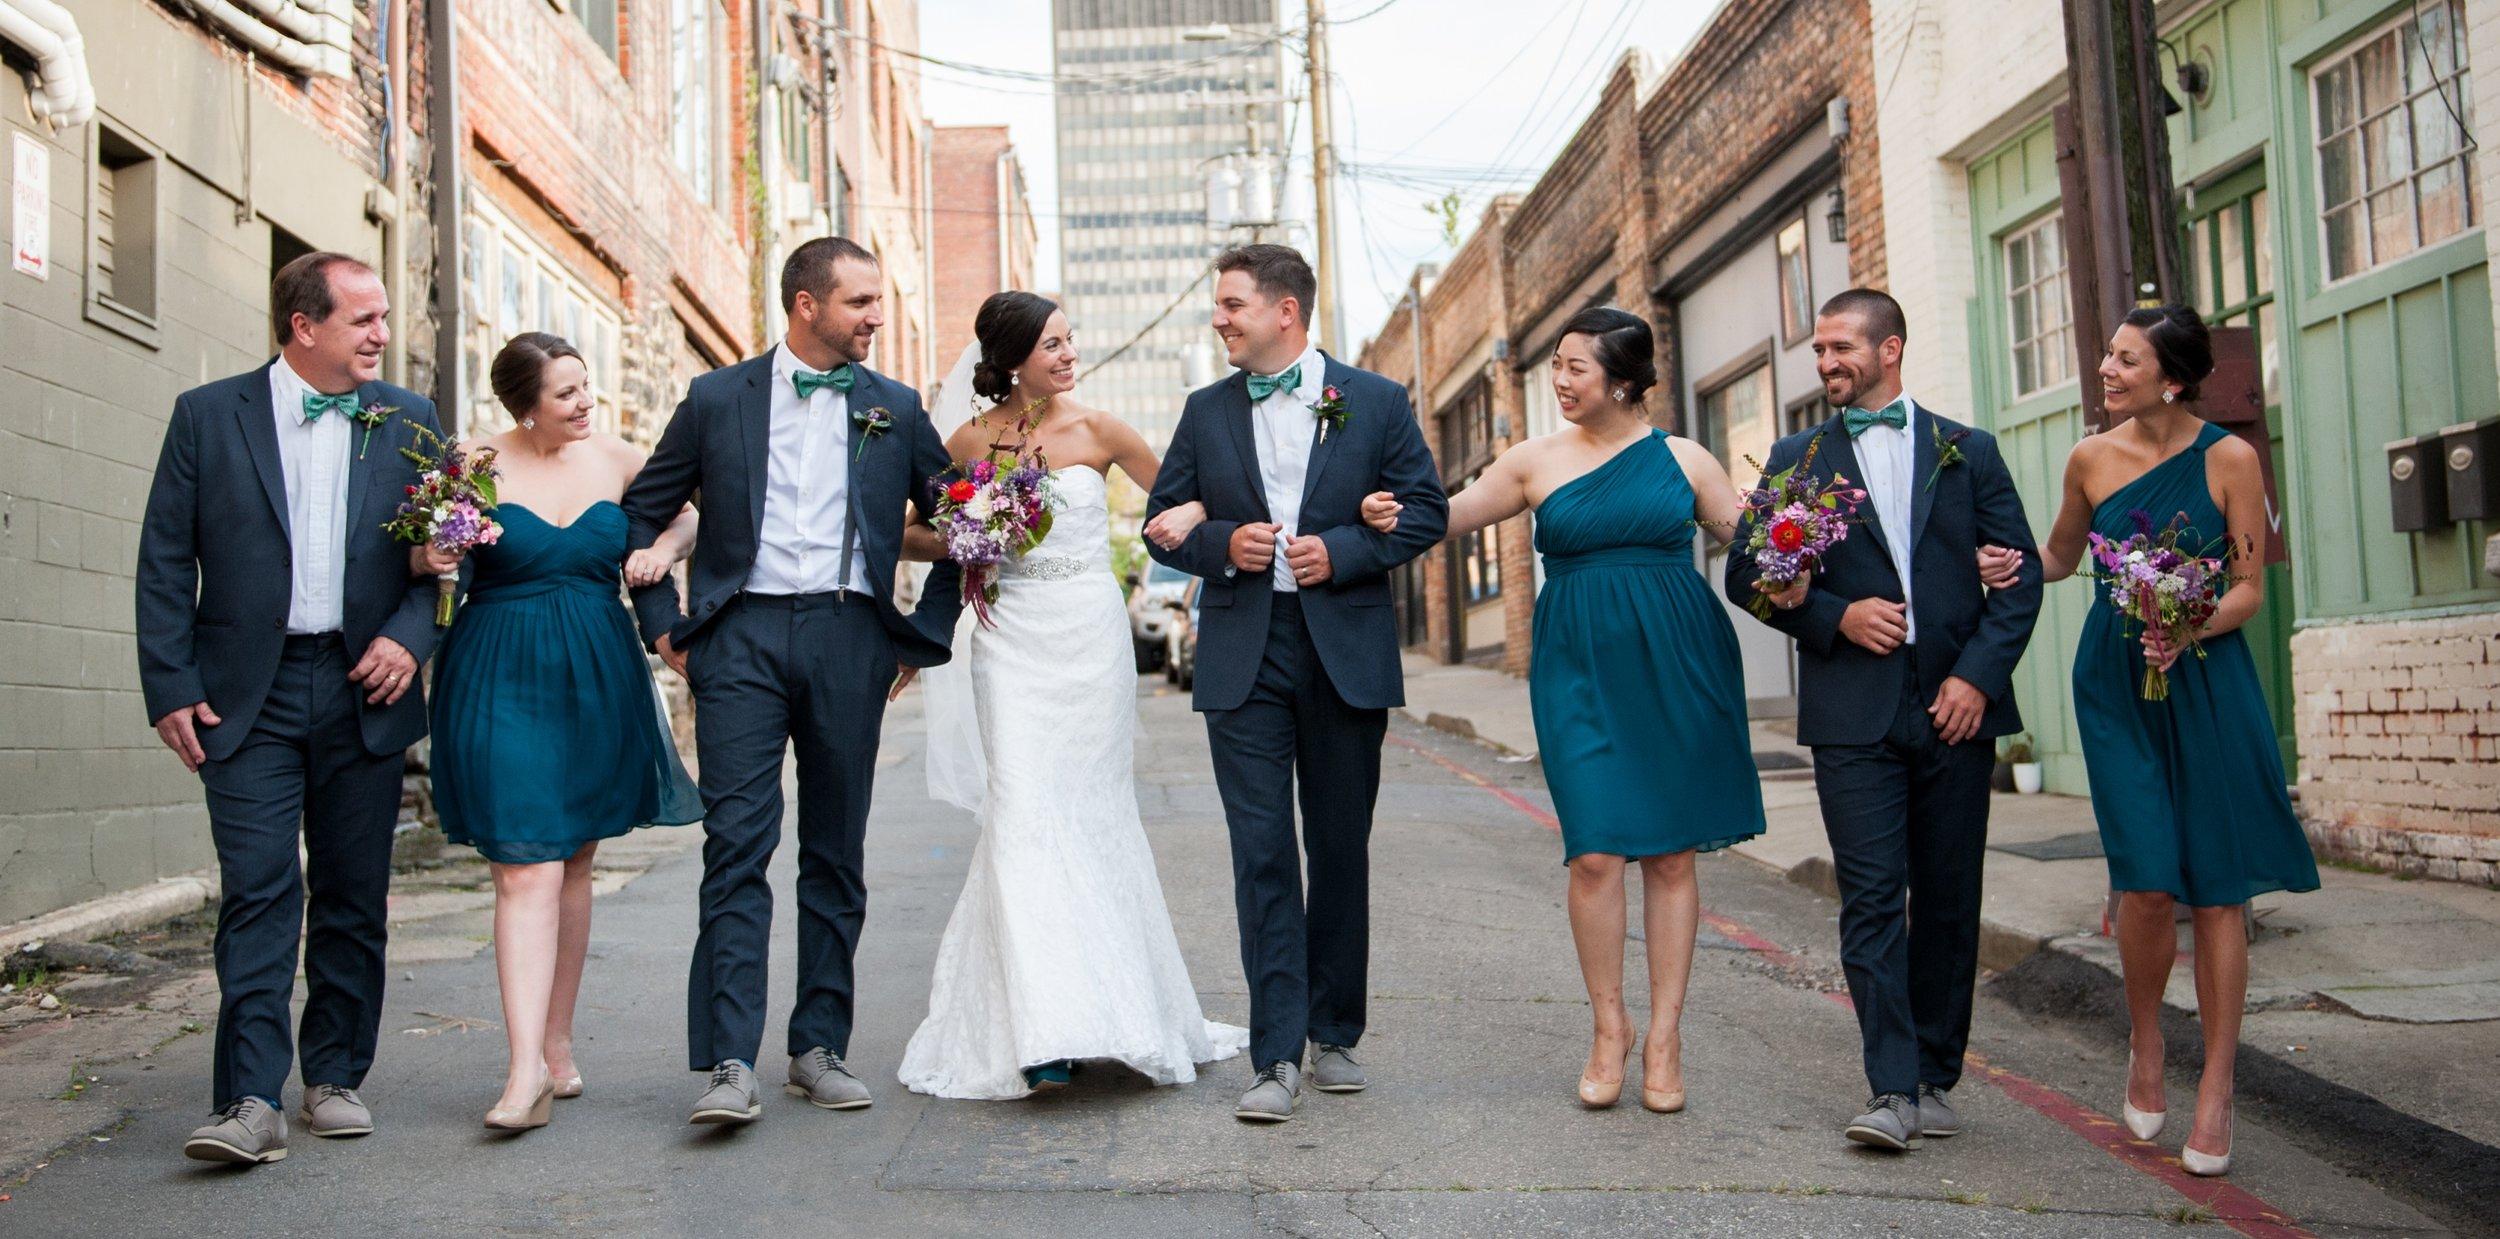 Weatherman_Wedding658_DSC7332 - Copy.jpg